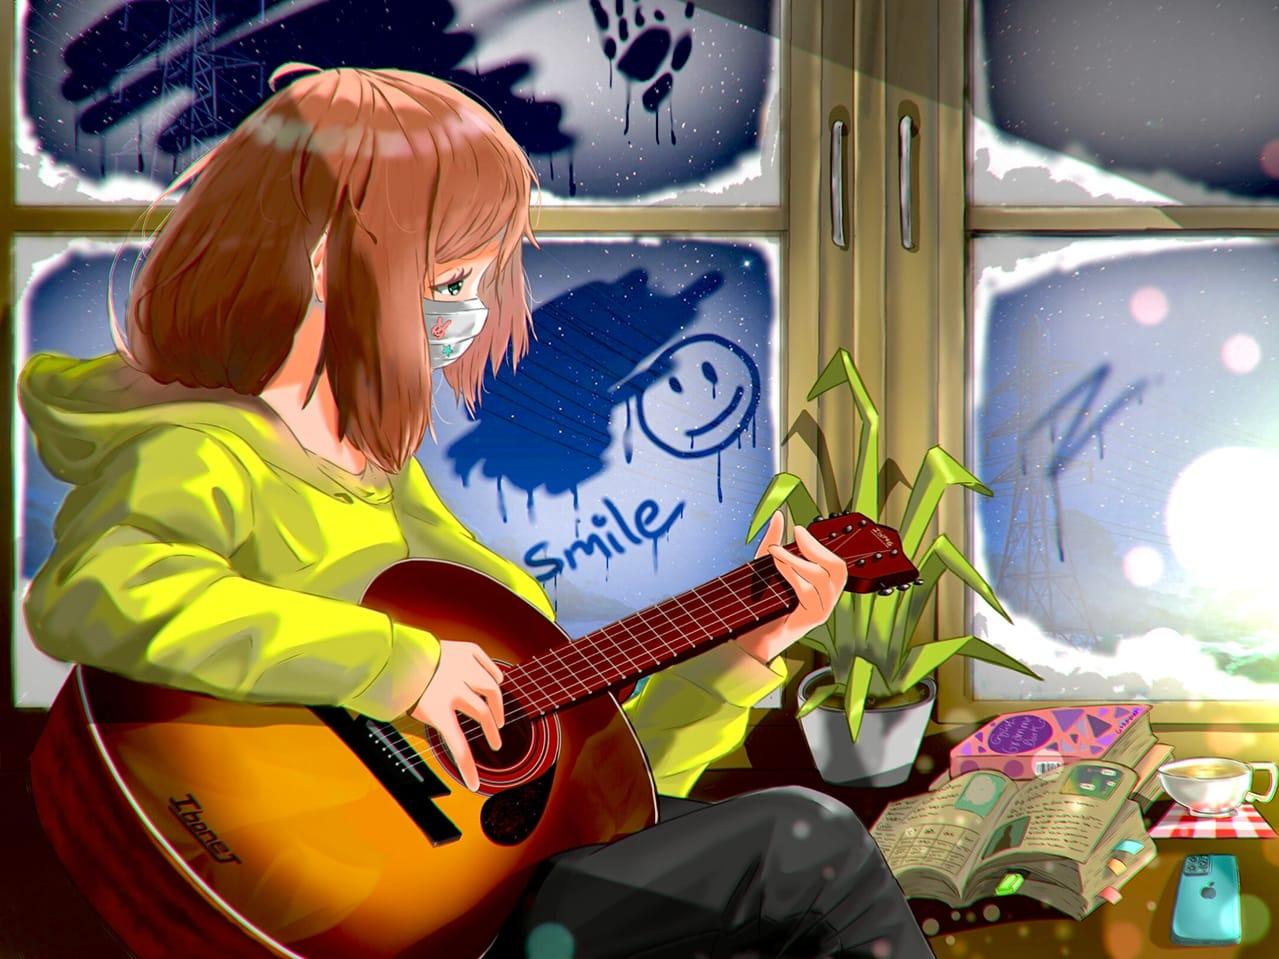 Lonely, I'm so lonely  Illust of Aryan borah January2021_Contest:OC December2020_Contest:Santa anime woman animegirl oc original art winter digital